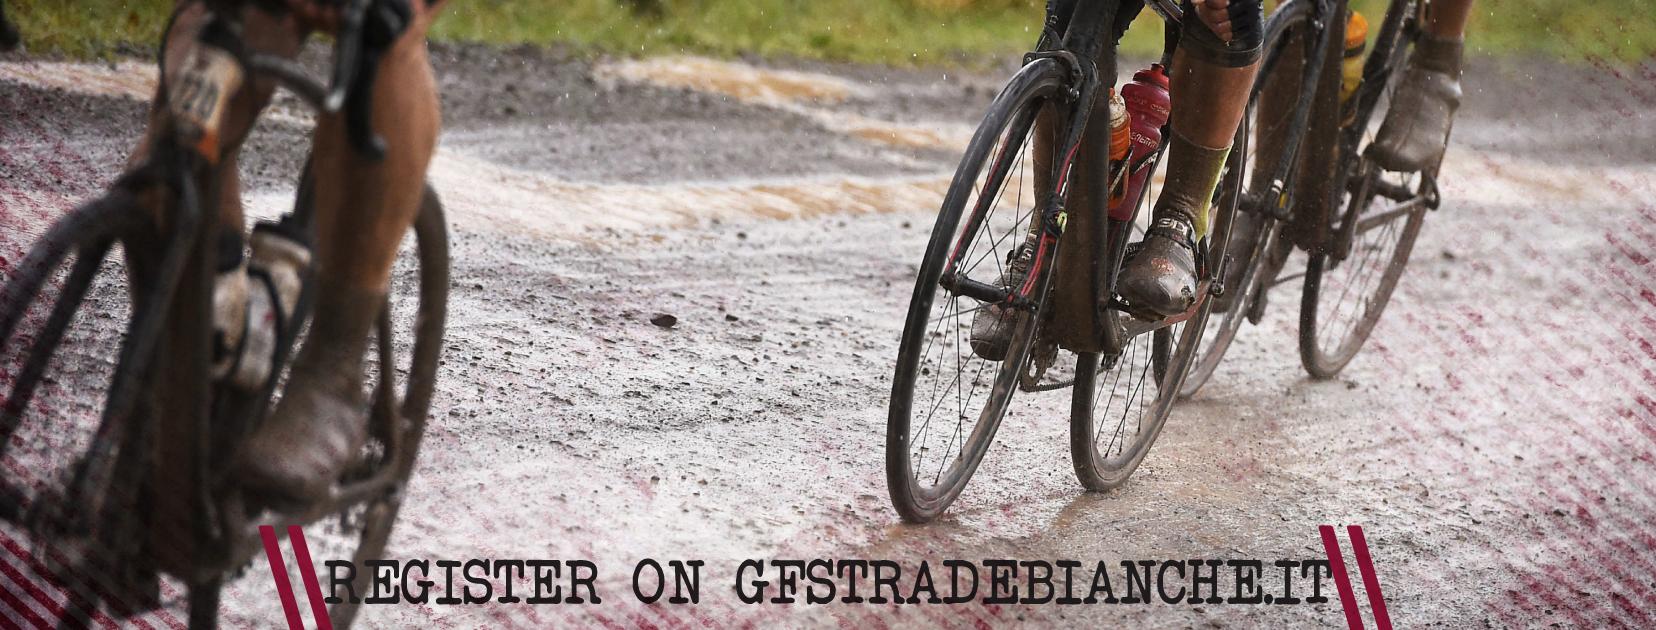 Registrations for the Gran Fondo Strade Bianche 2019 are open!